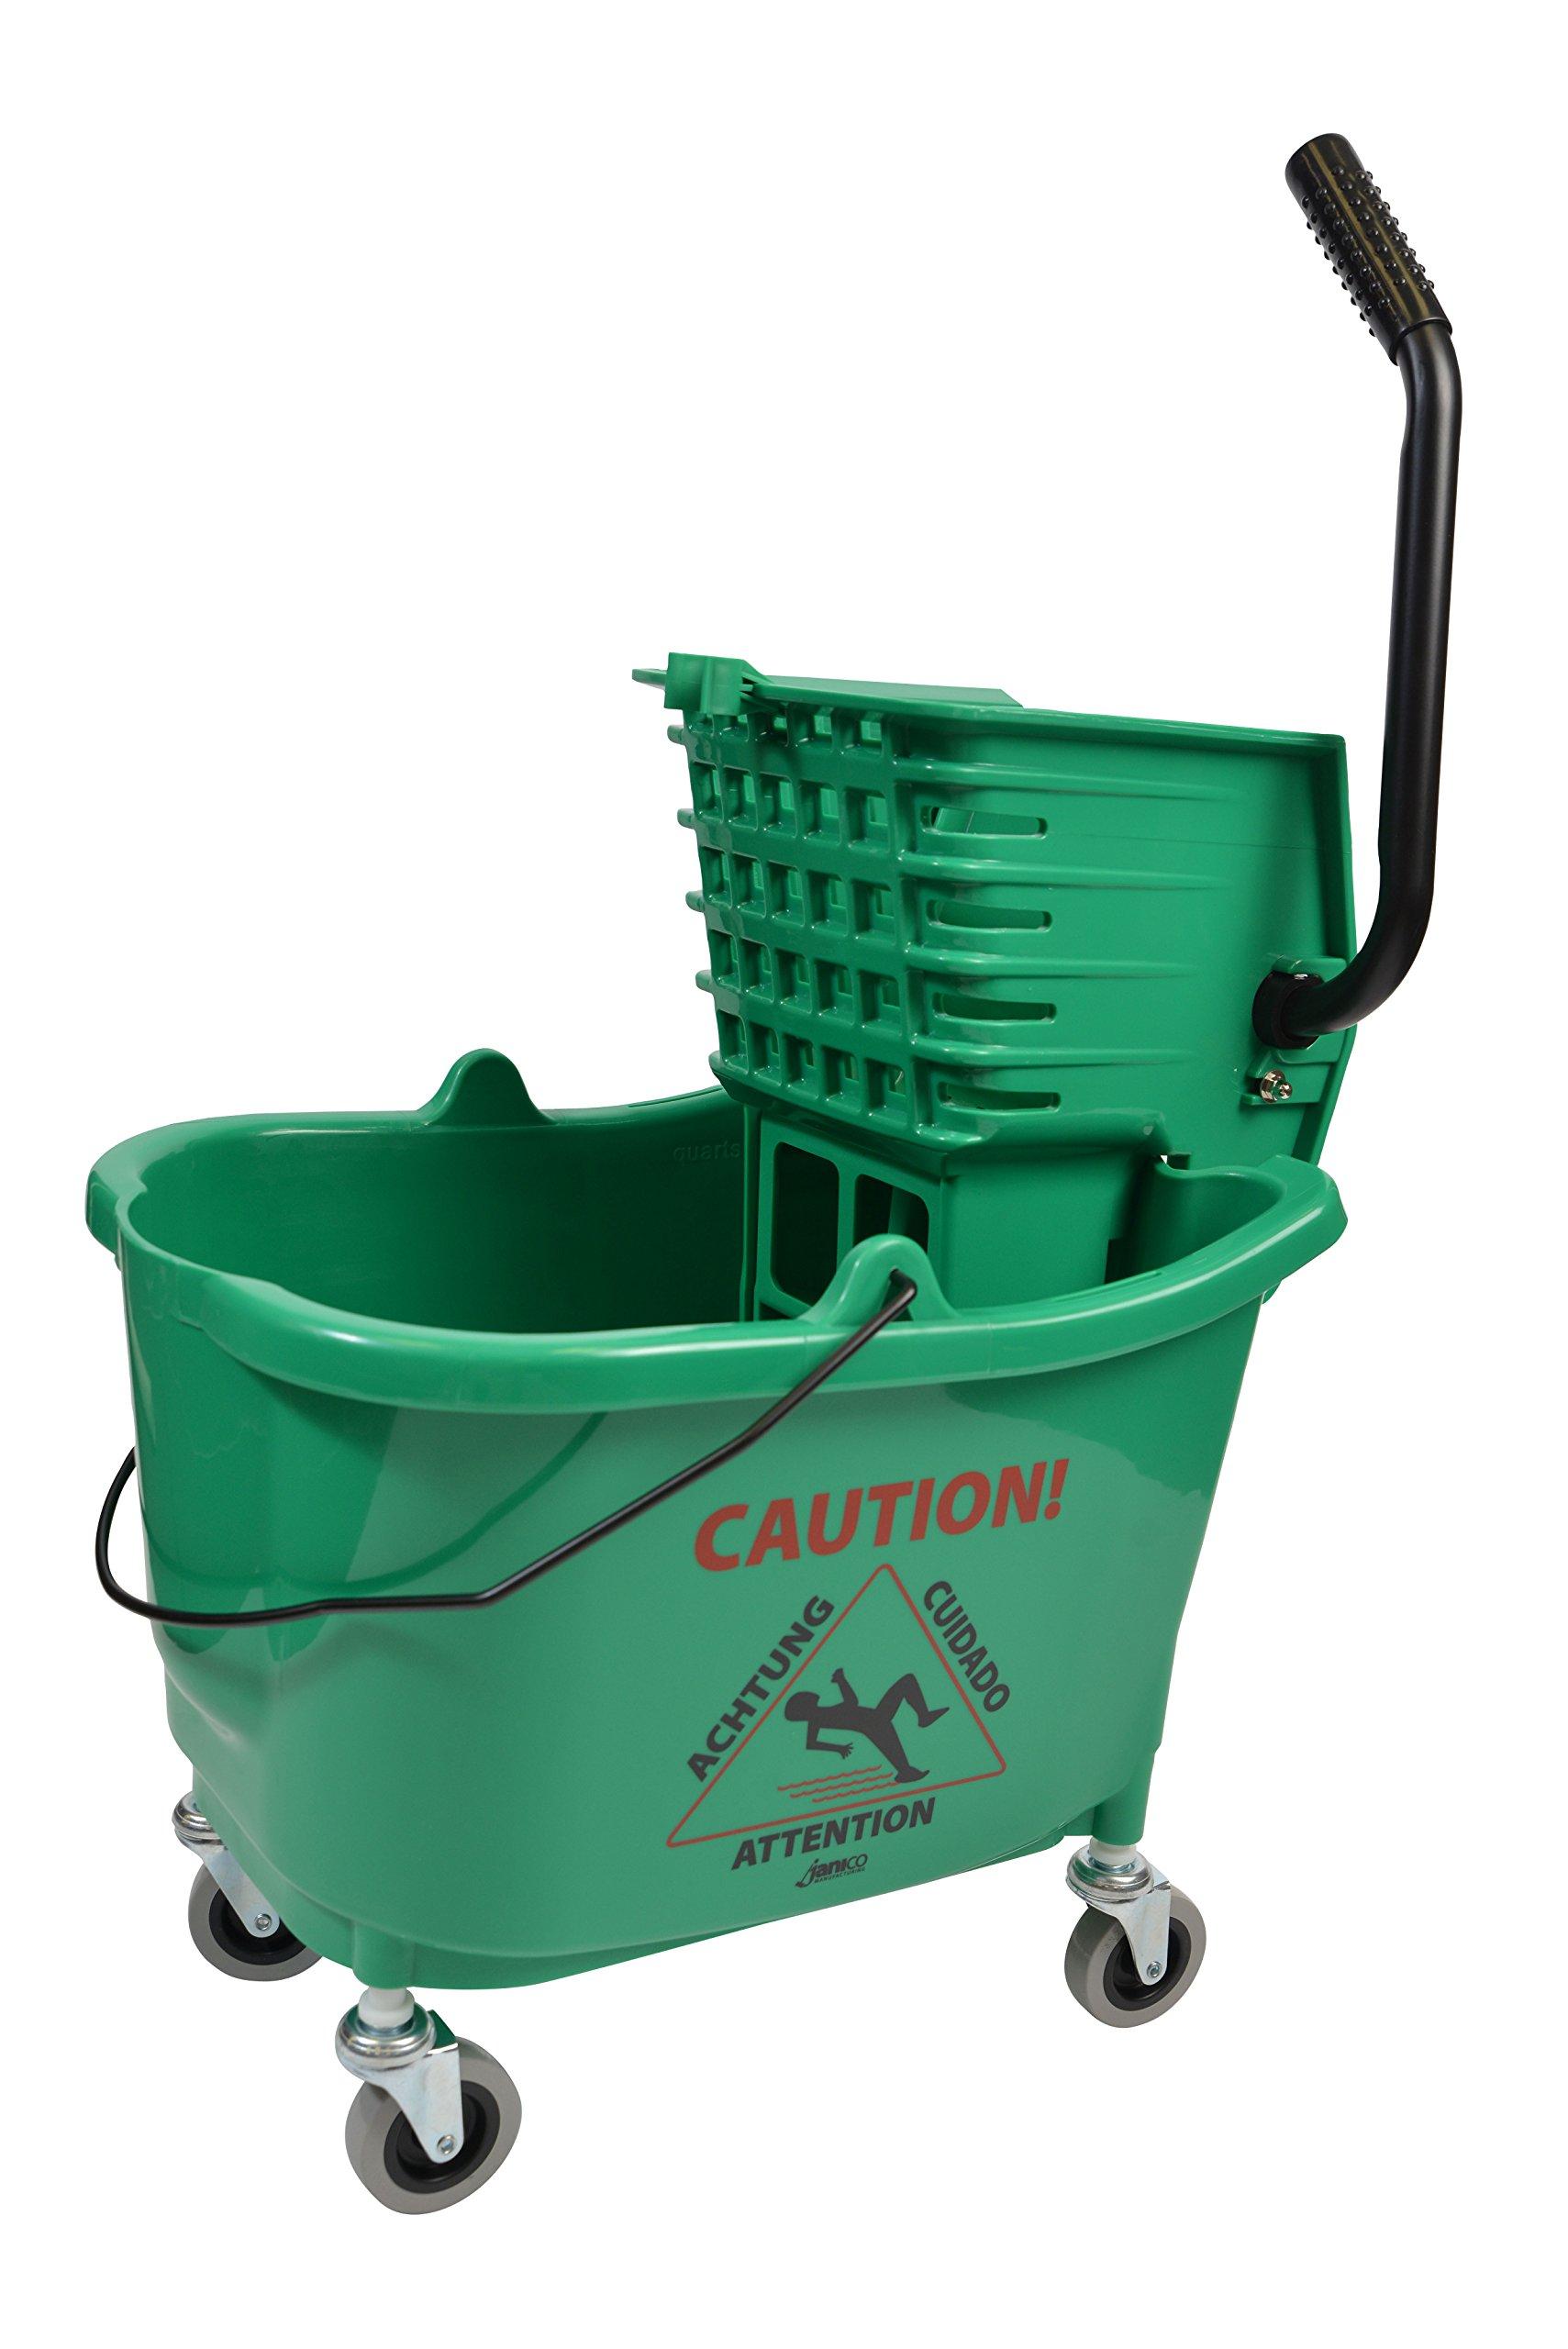 Janico Inc Mop Bucket Side Press Wringer Combo, 35 Quart 8.5 Gallon, Green, 3 Inch Non Marking Metal Casters (35 Quart, Green)